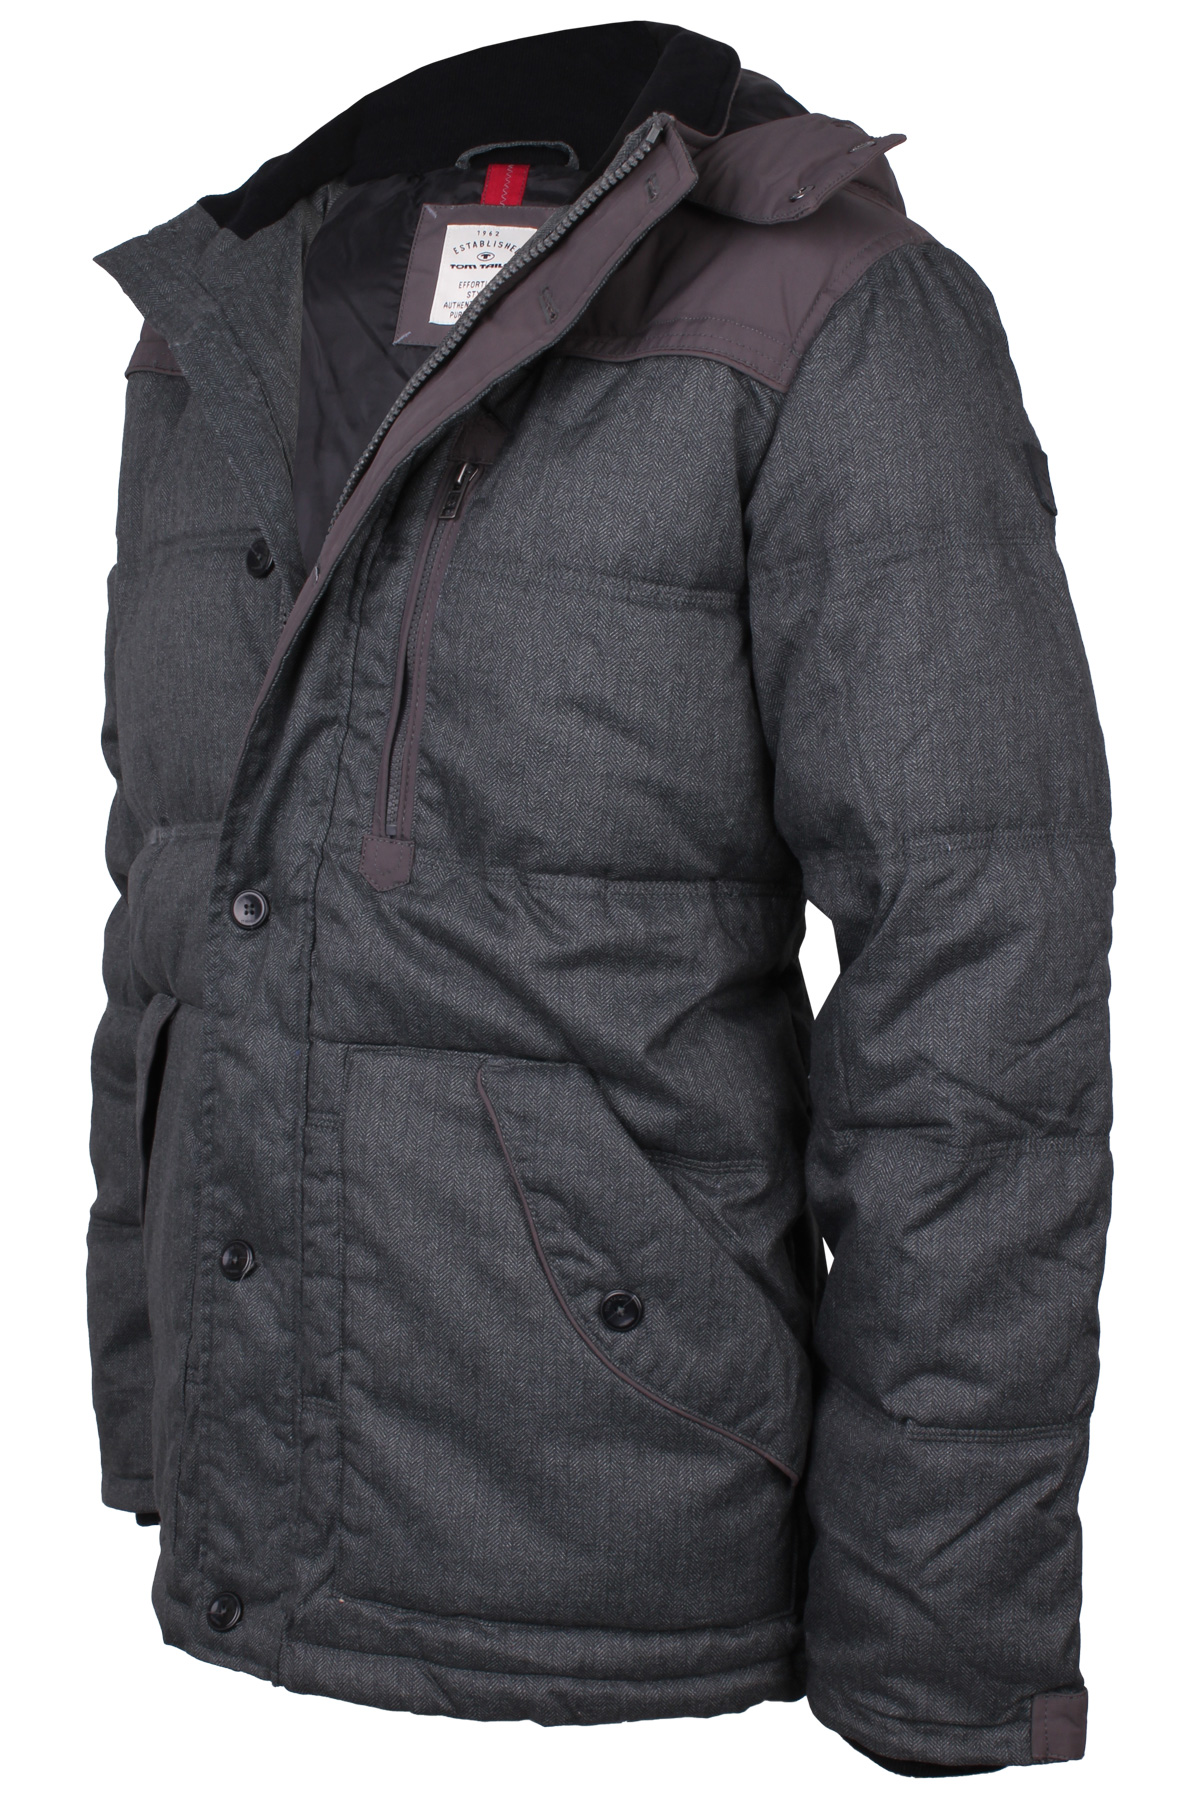 tom tailor herren jacke 35202840010 fabric mix 2505 grau. Black Bedroom Furniture Sets. Home Design Ideas